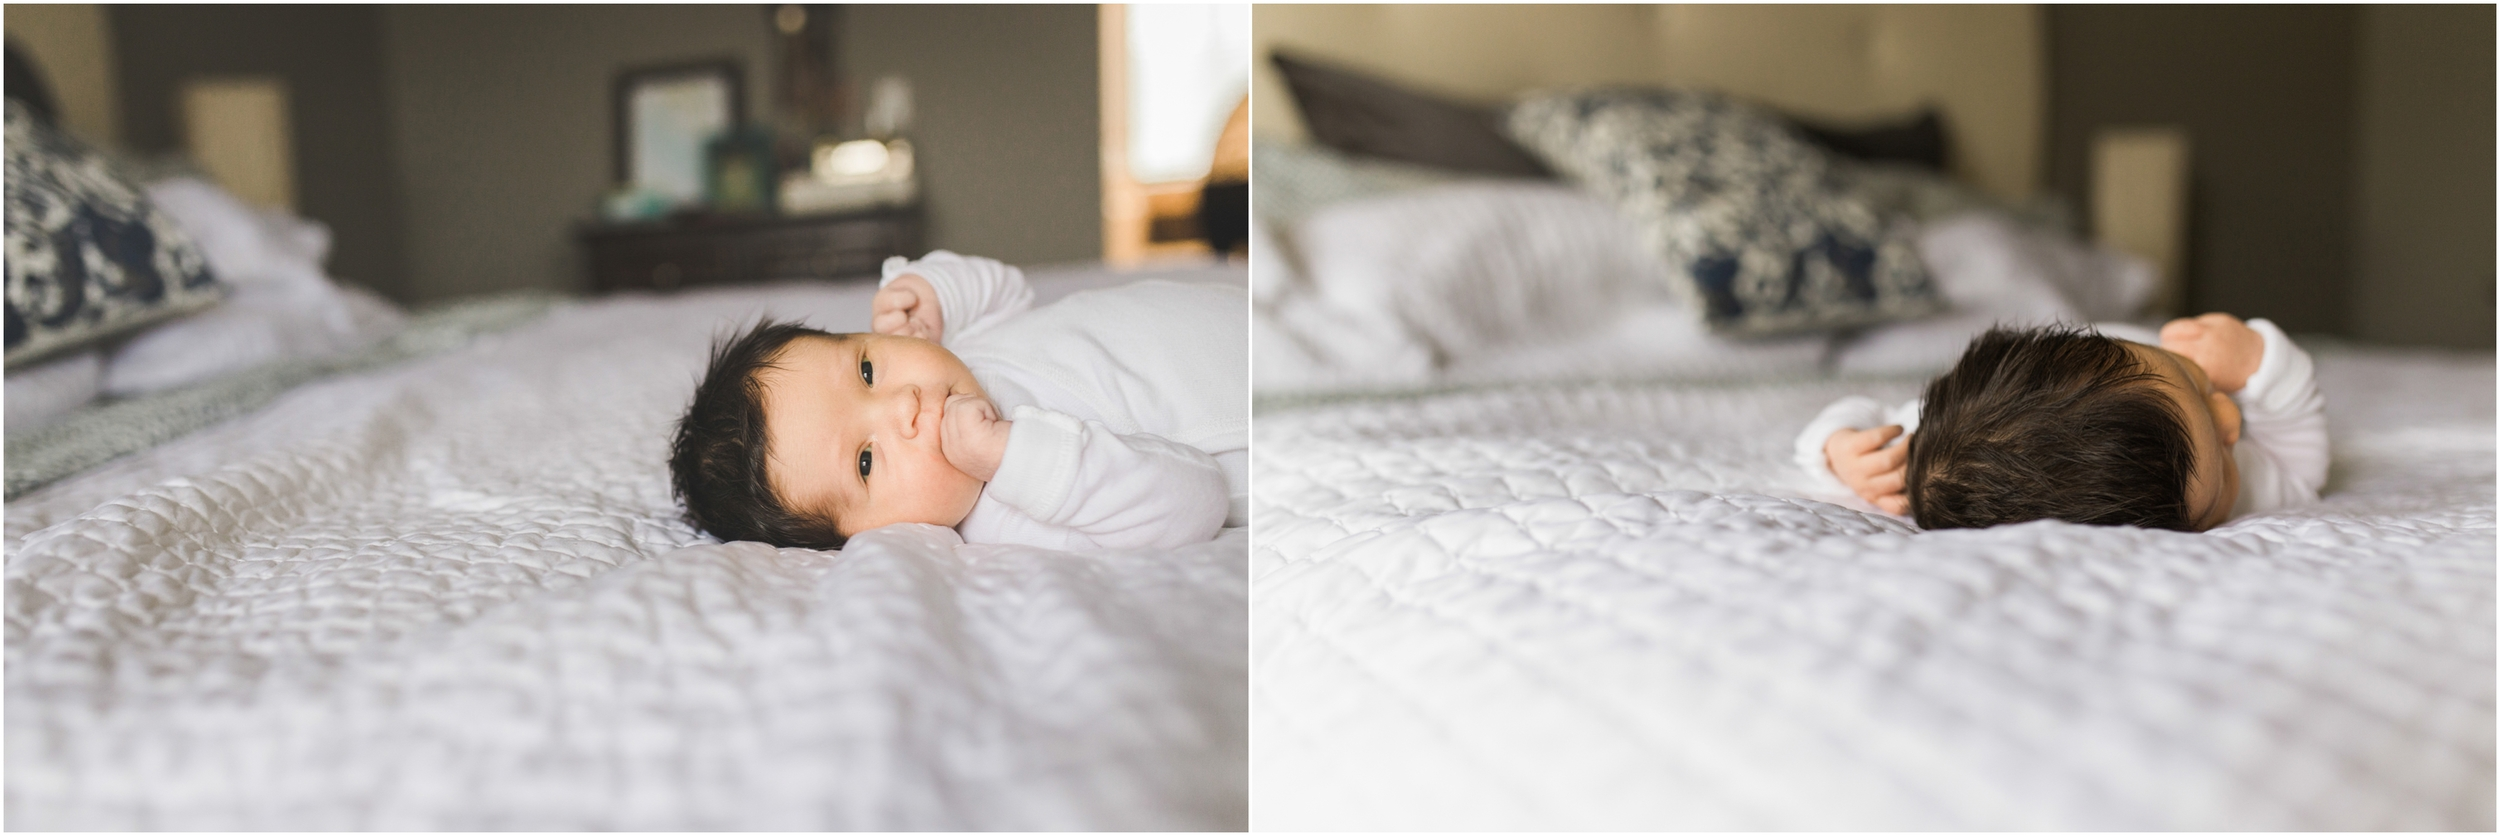 seattle lifestyle newborn photographer_001.jpg